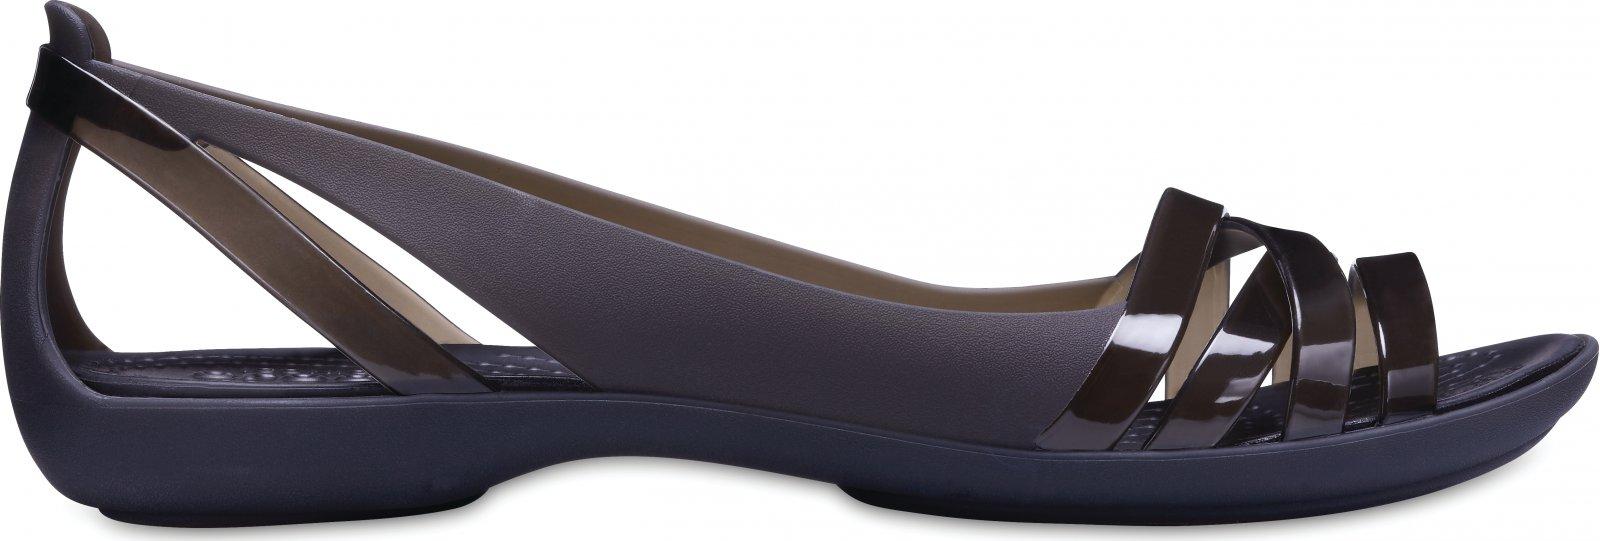 3ede74990914 Crocs Isabella Huarache 2 Flat W černé od 1 064 Kč